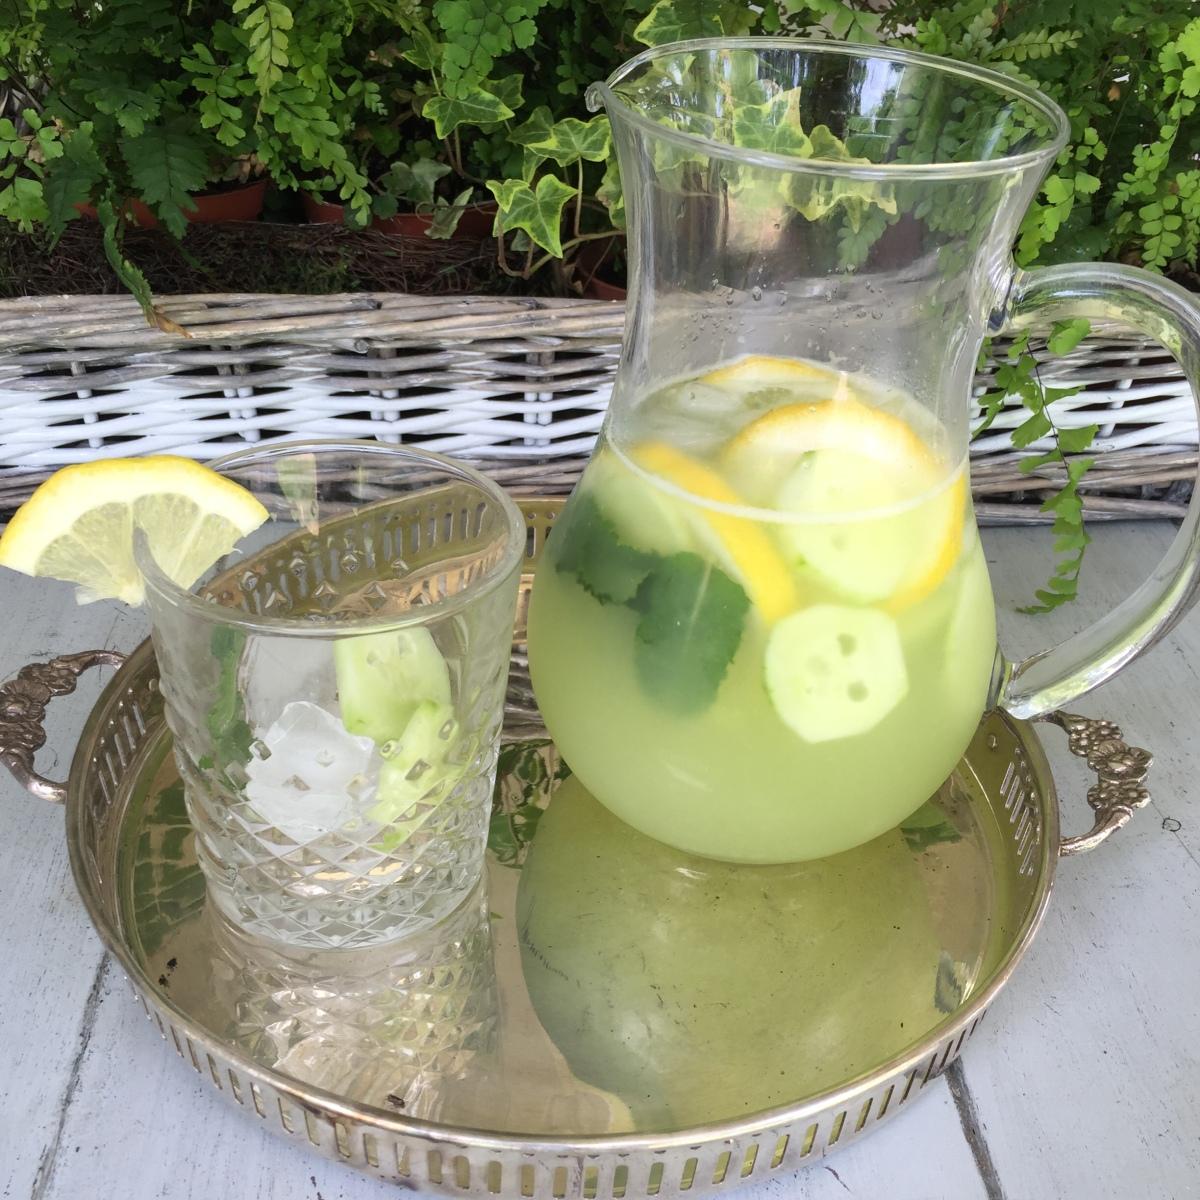 Limonada de pepino yhierbabuena